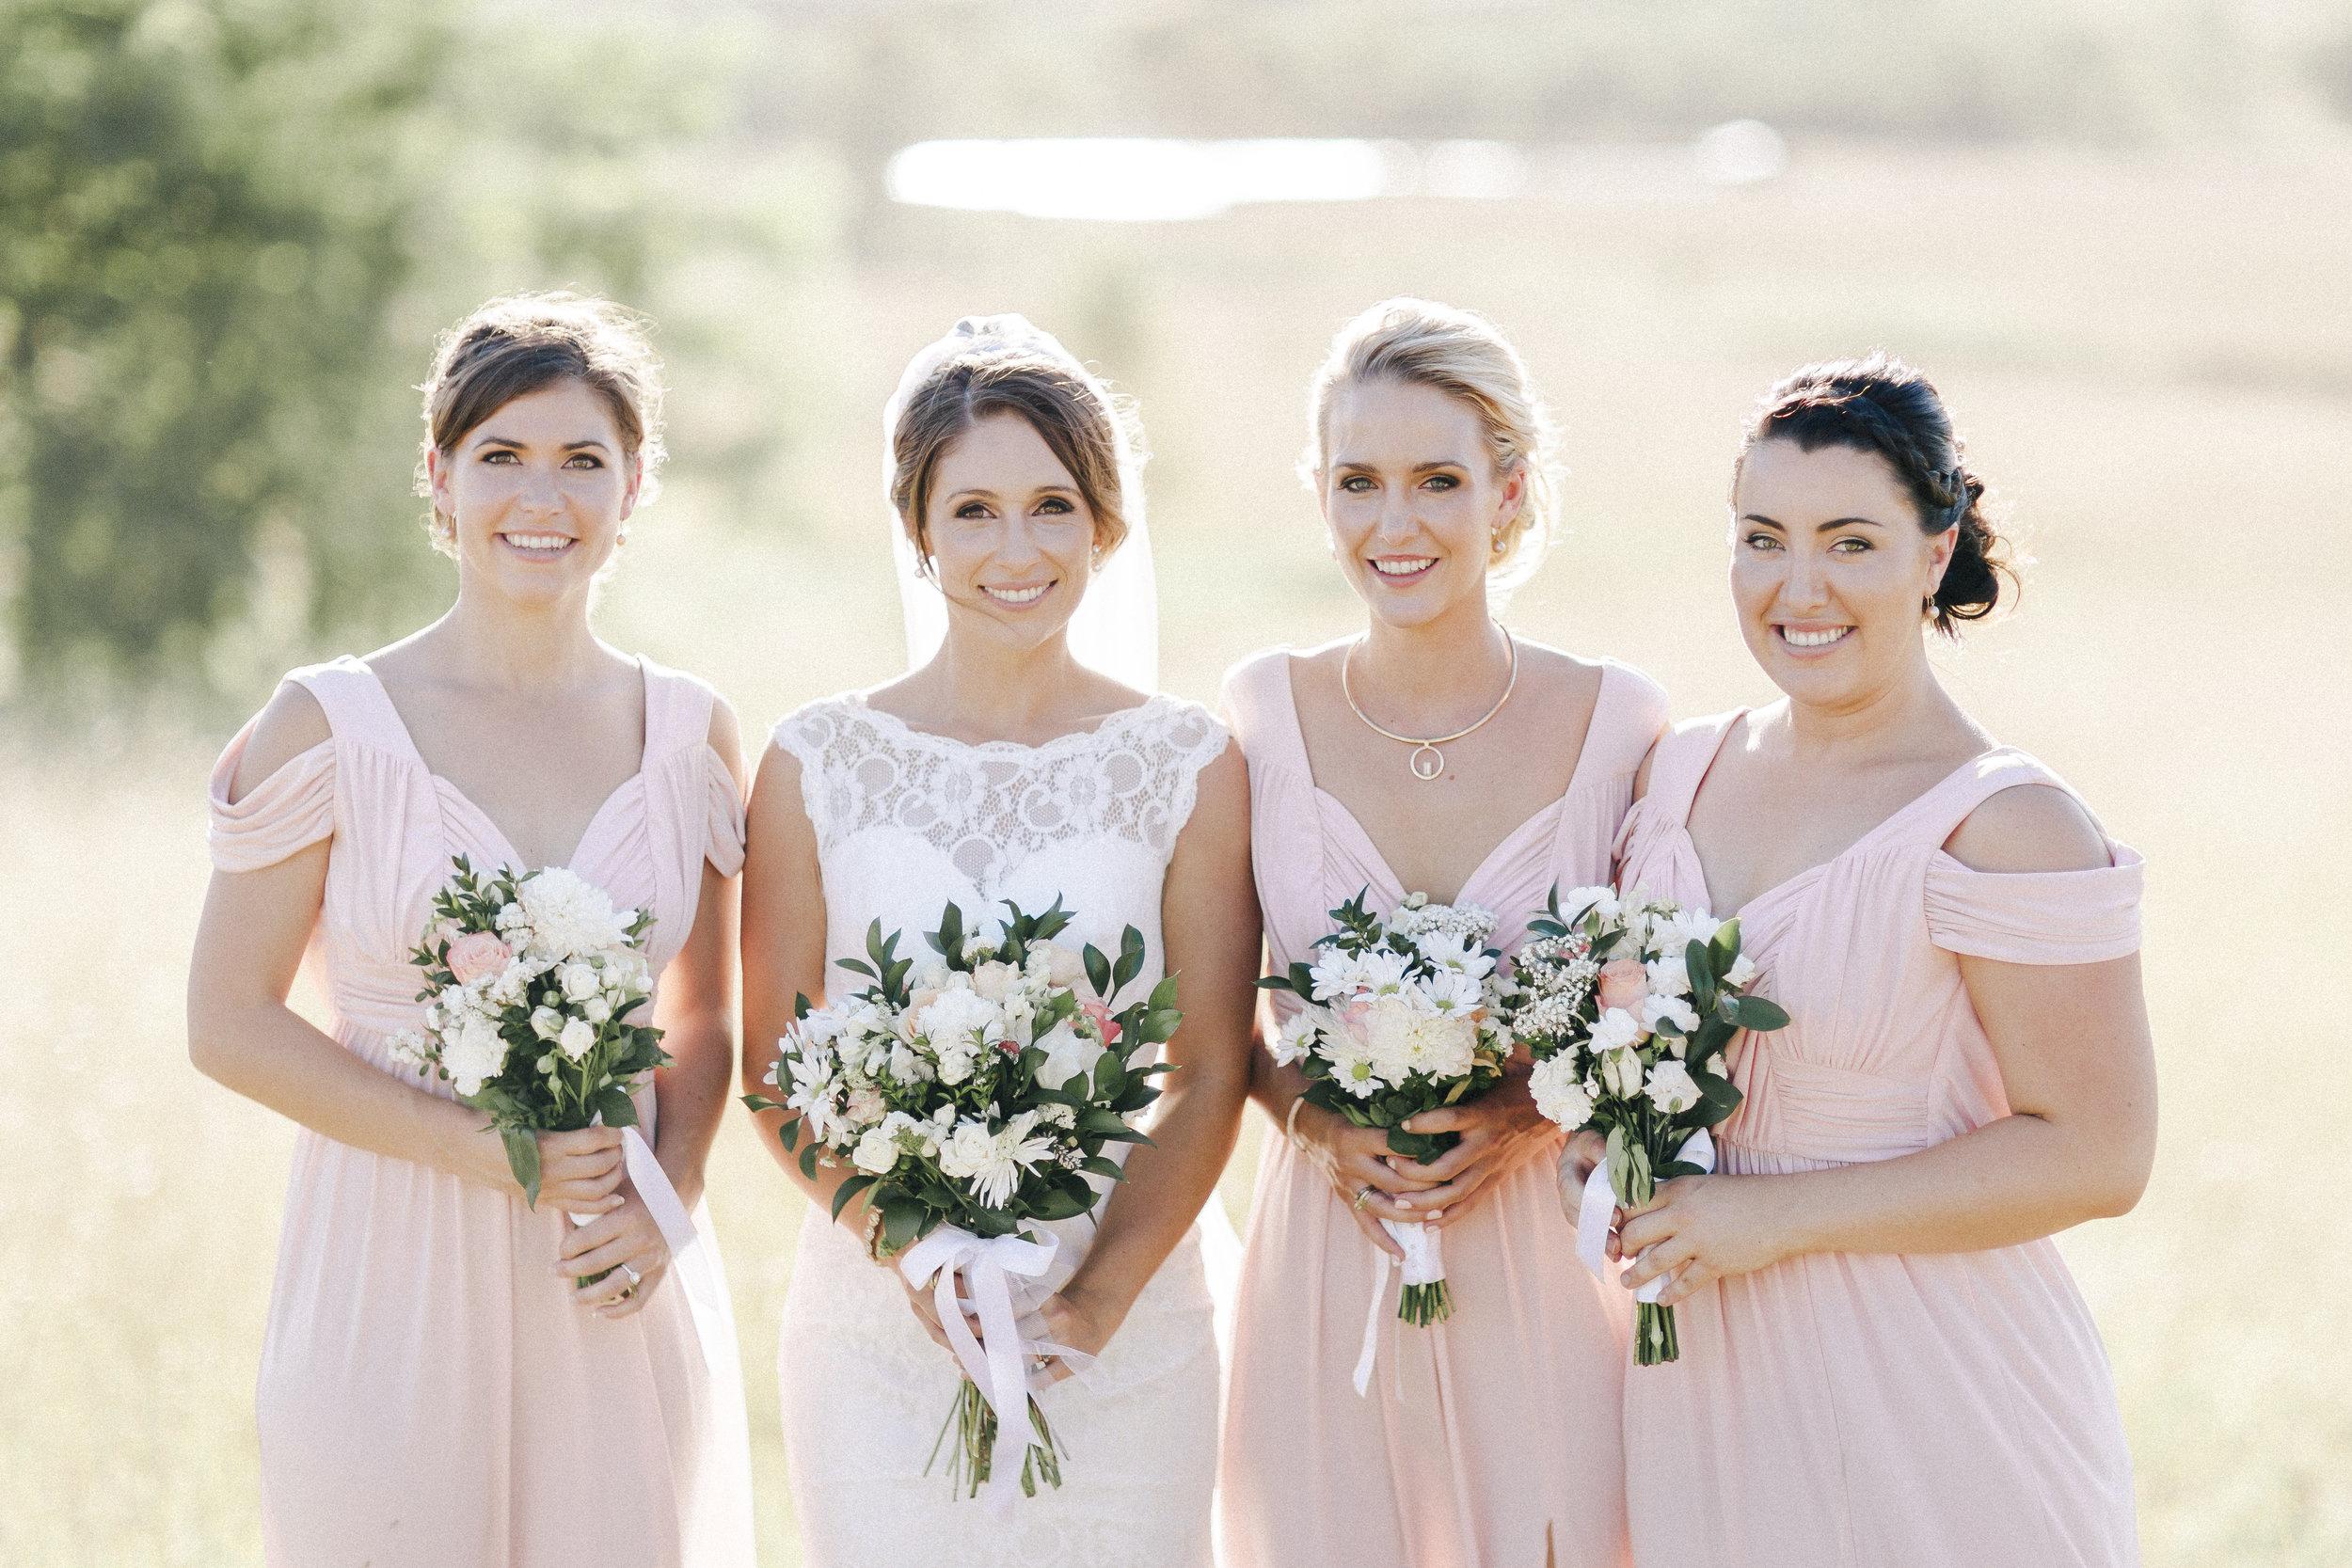 WeddingPhotos_HighResolution-1377.jpg